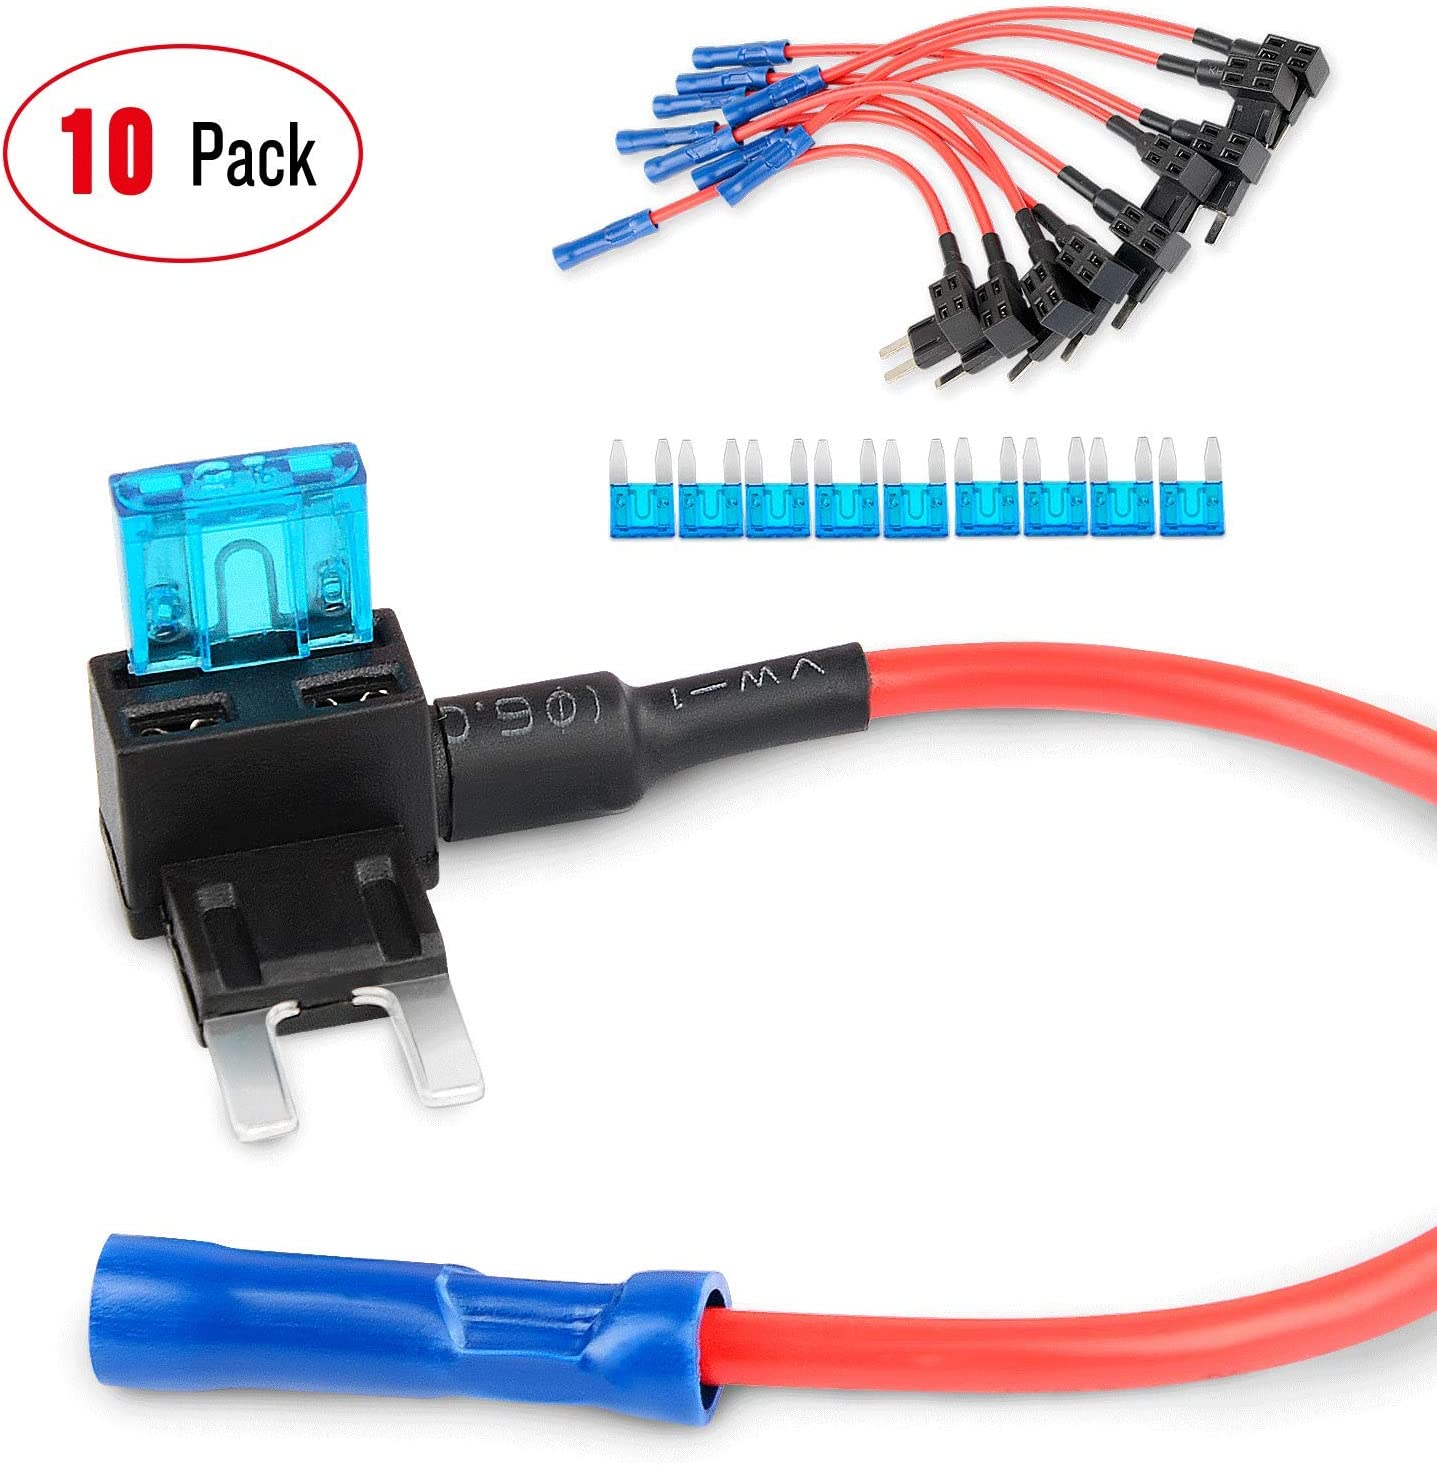 amazon.com: nilight fuse holder add-a-circuit fuse tap adapter mini atm apm  blade fuse holder-10 pack , 2 years warranty : automotive  amazon.com